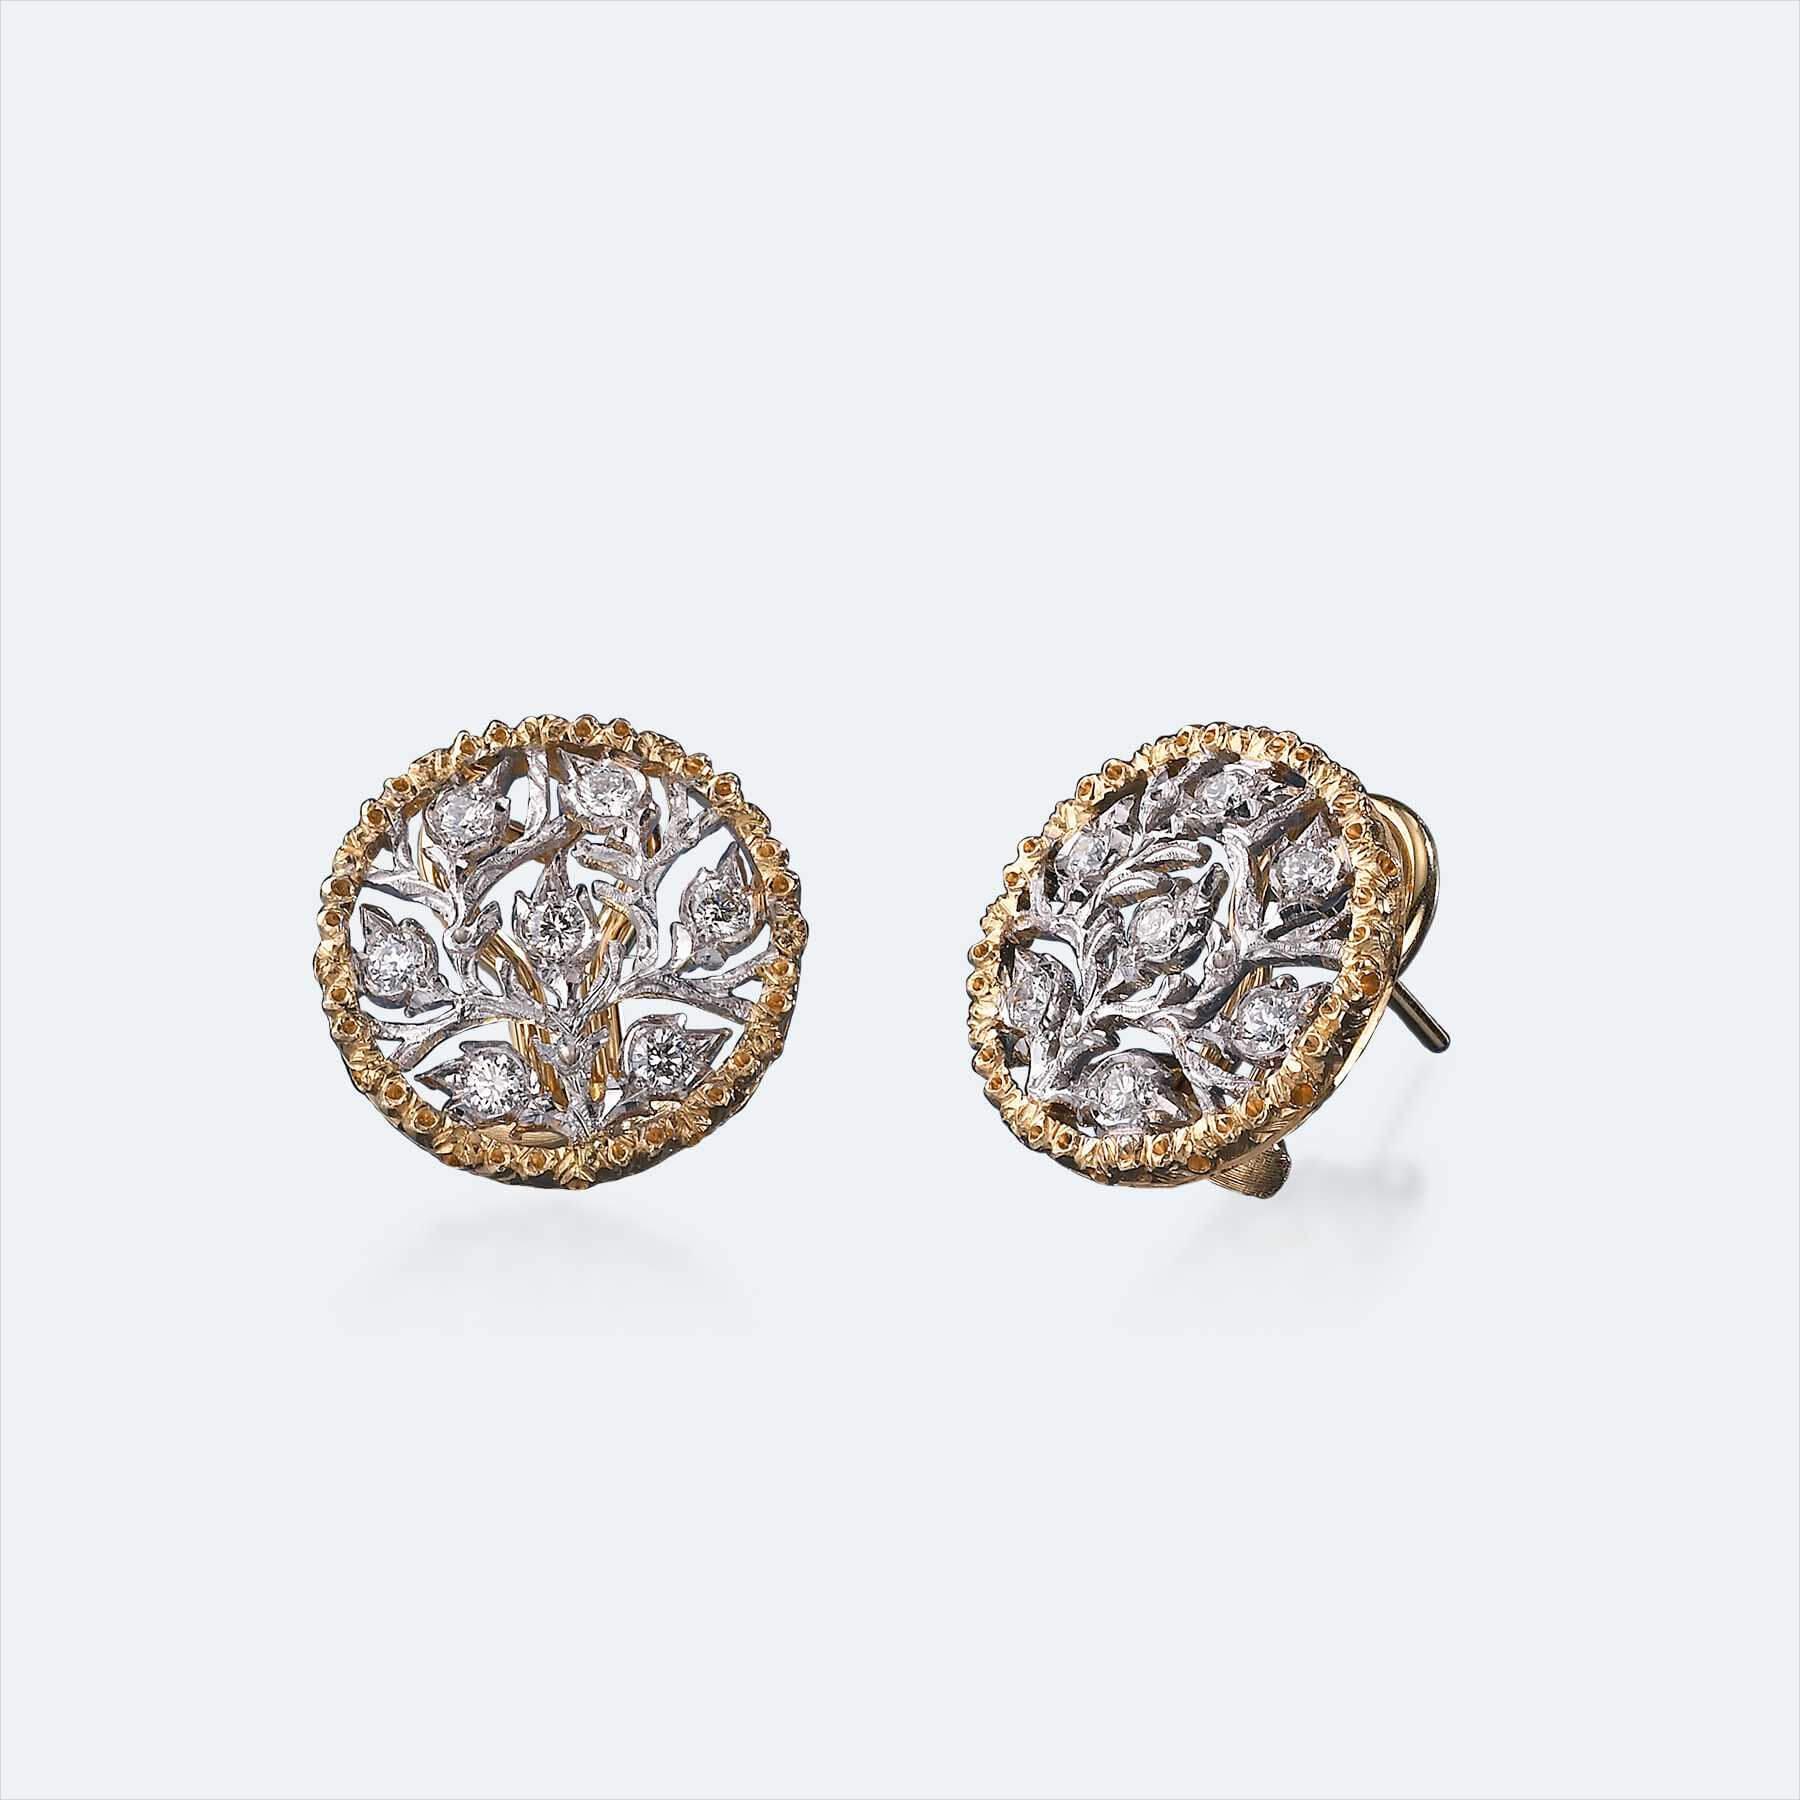 25 Diamond Earrings Designs Ideas Design Trends